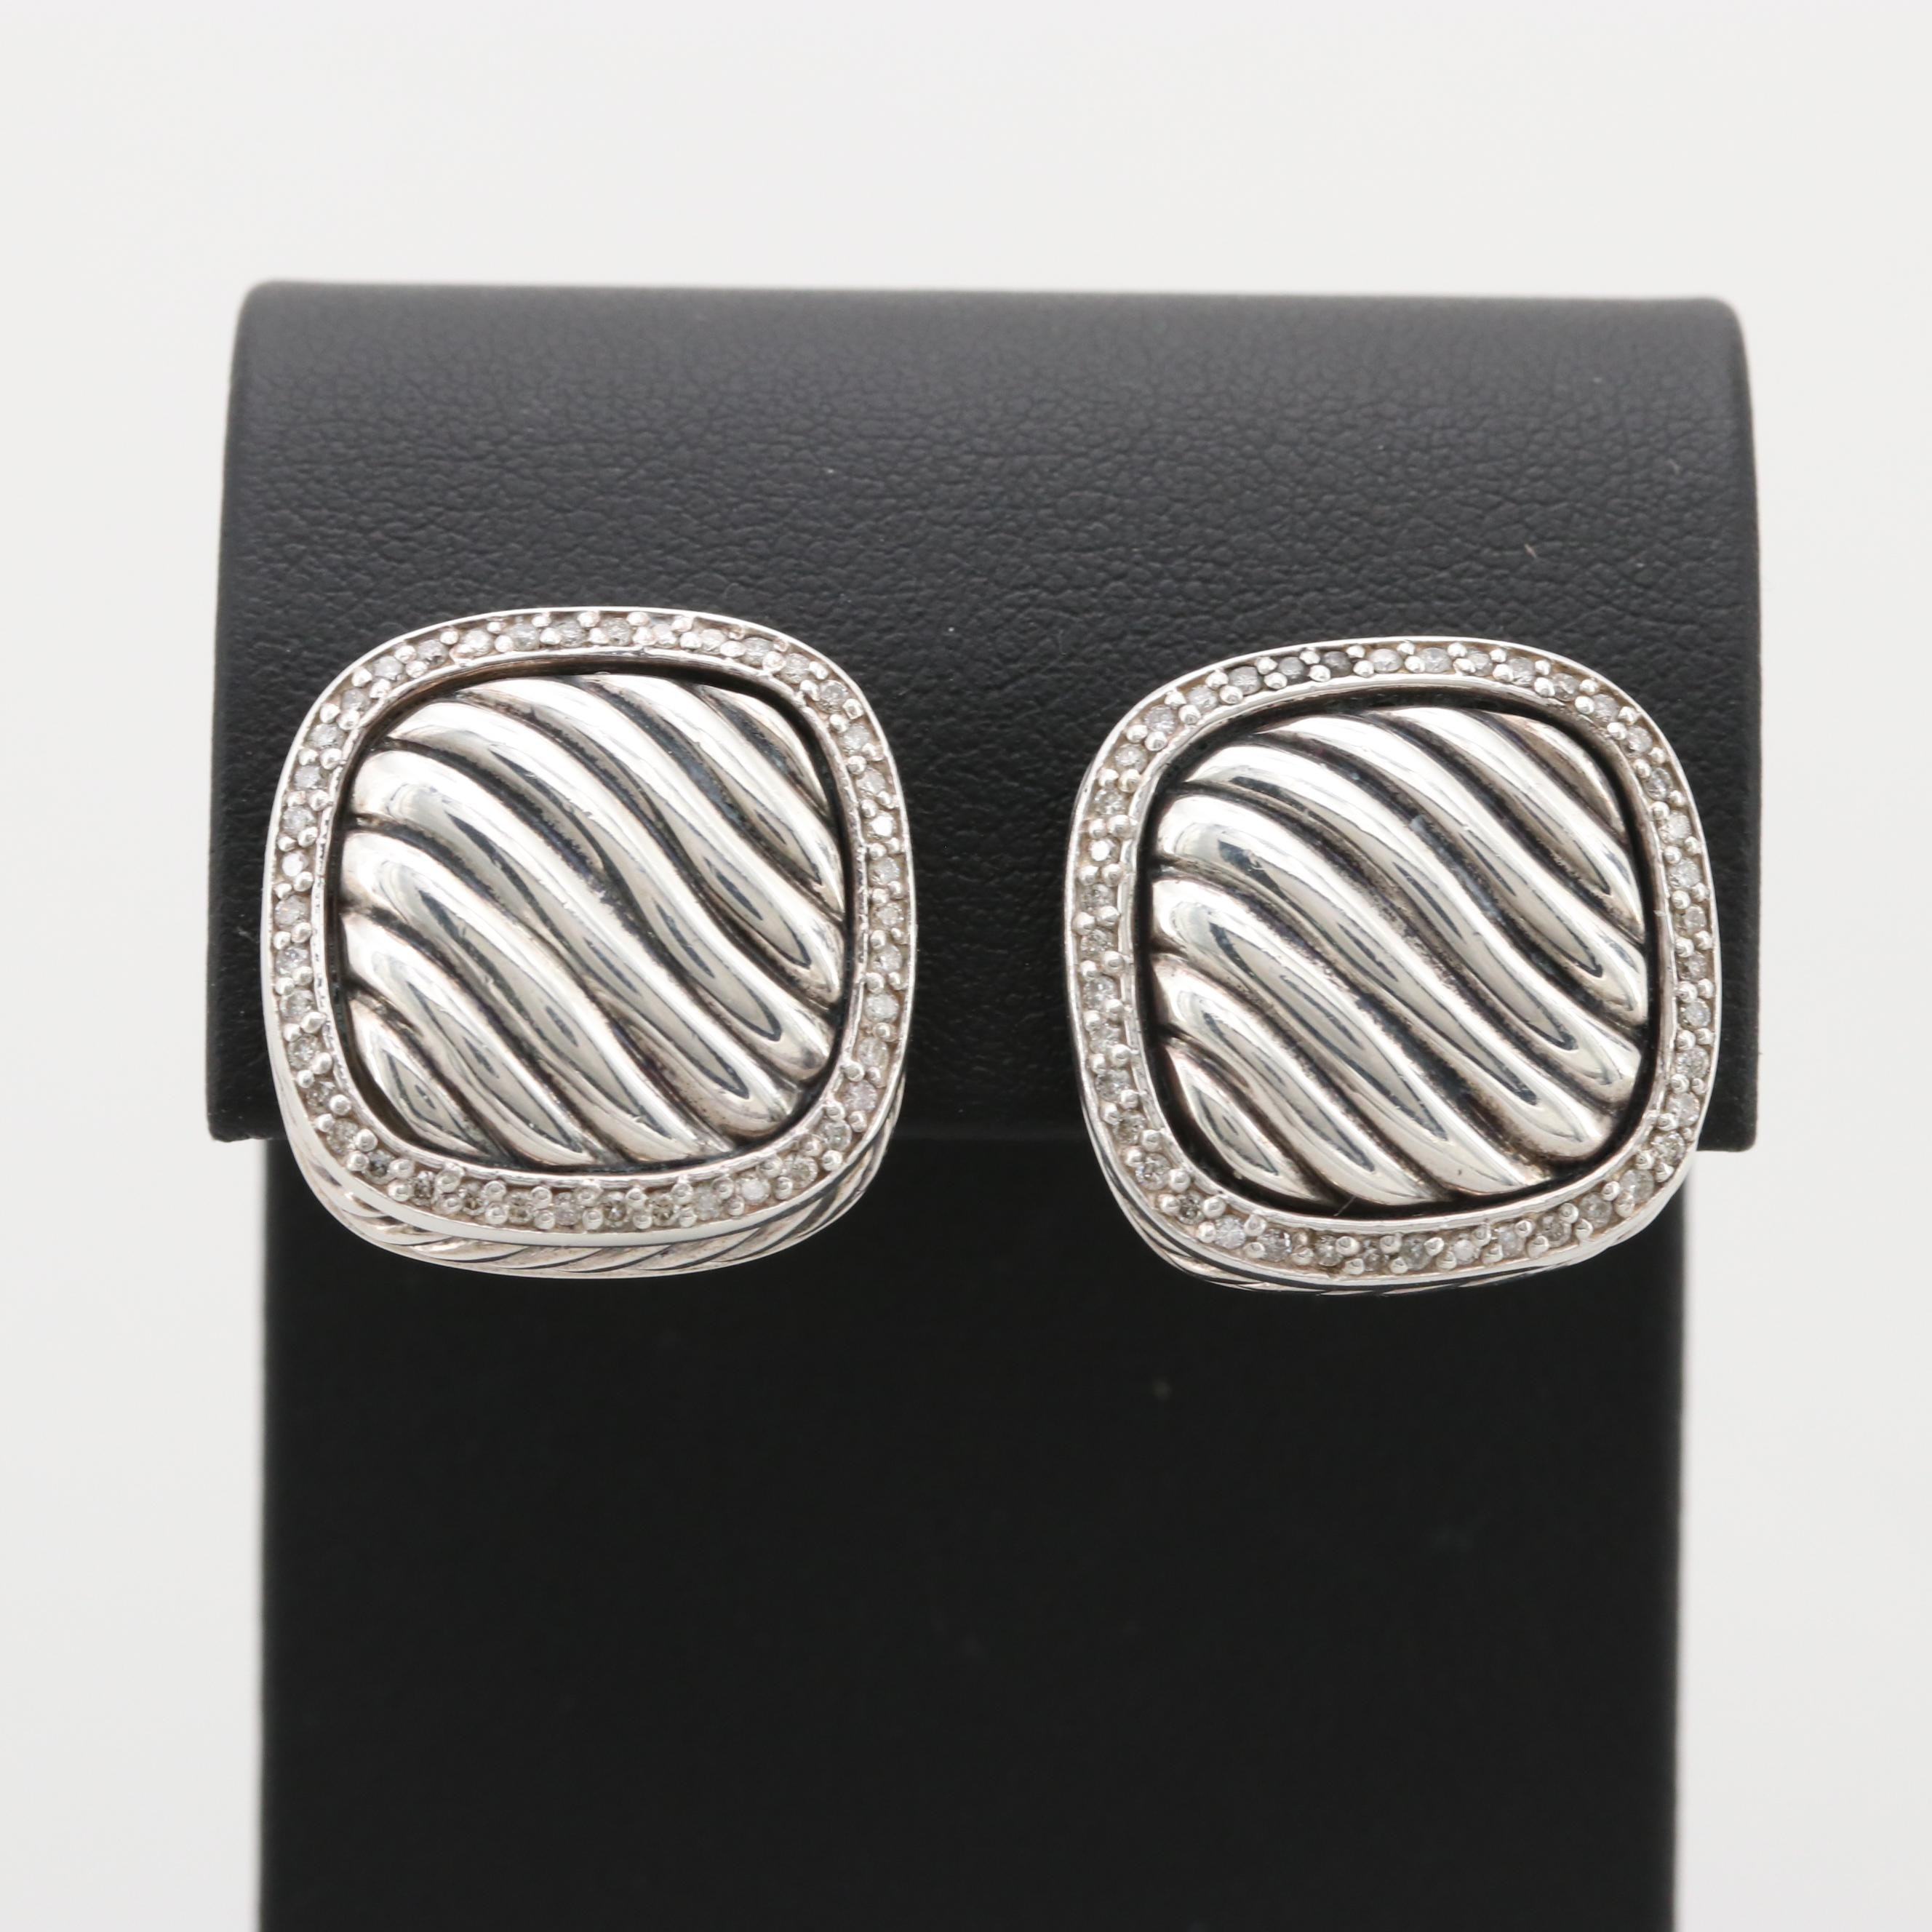 David Yurman Sterling Silver Diamond Earrings with 18K Yellow Gold Posts